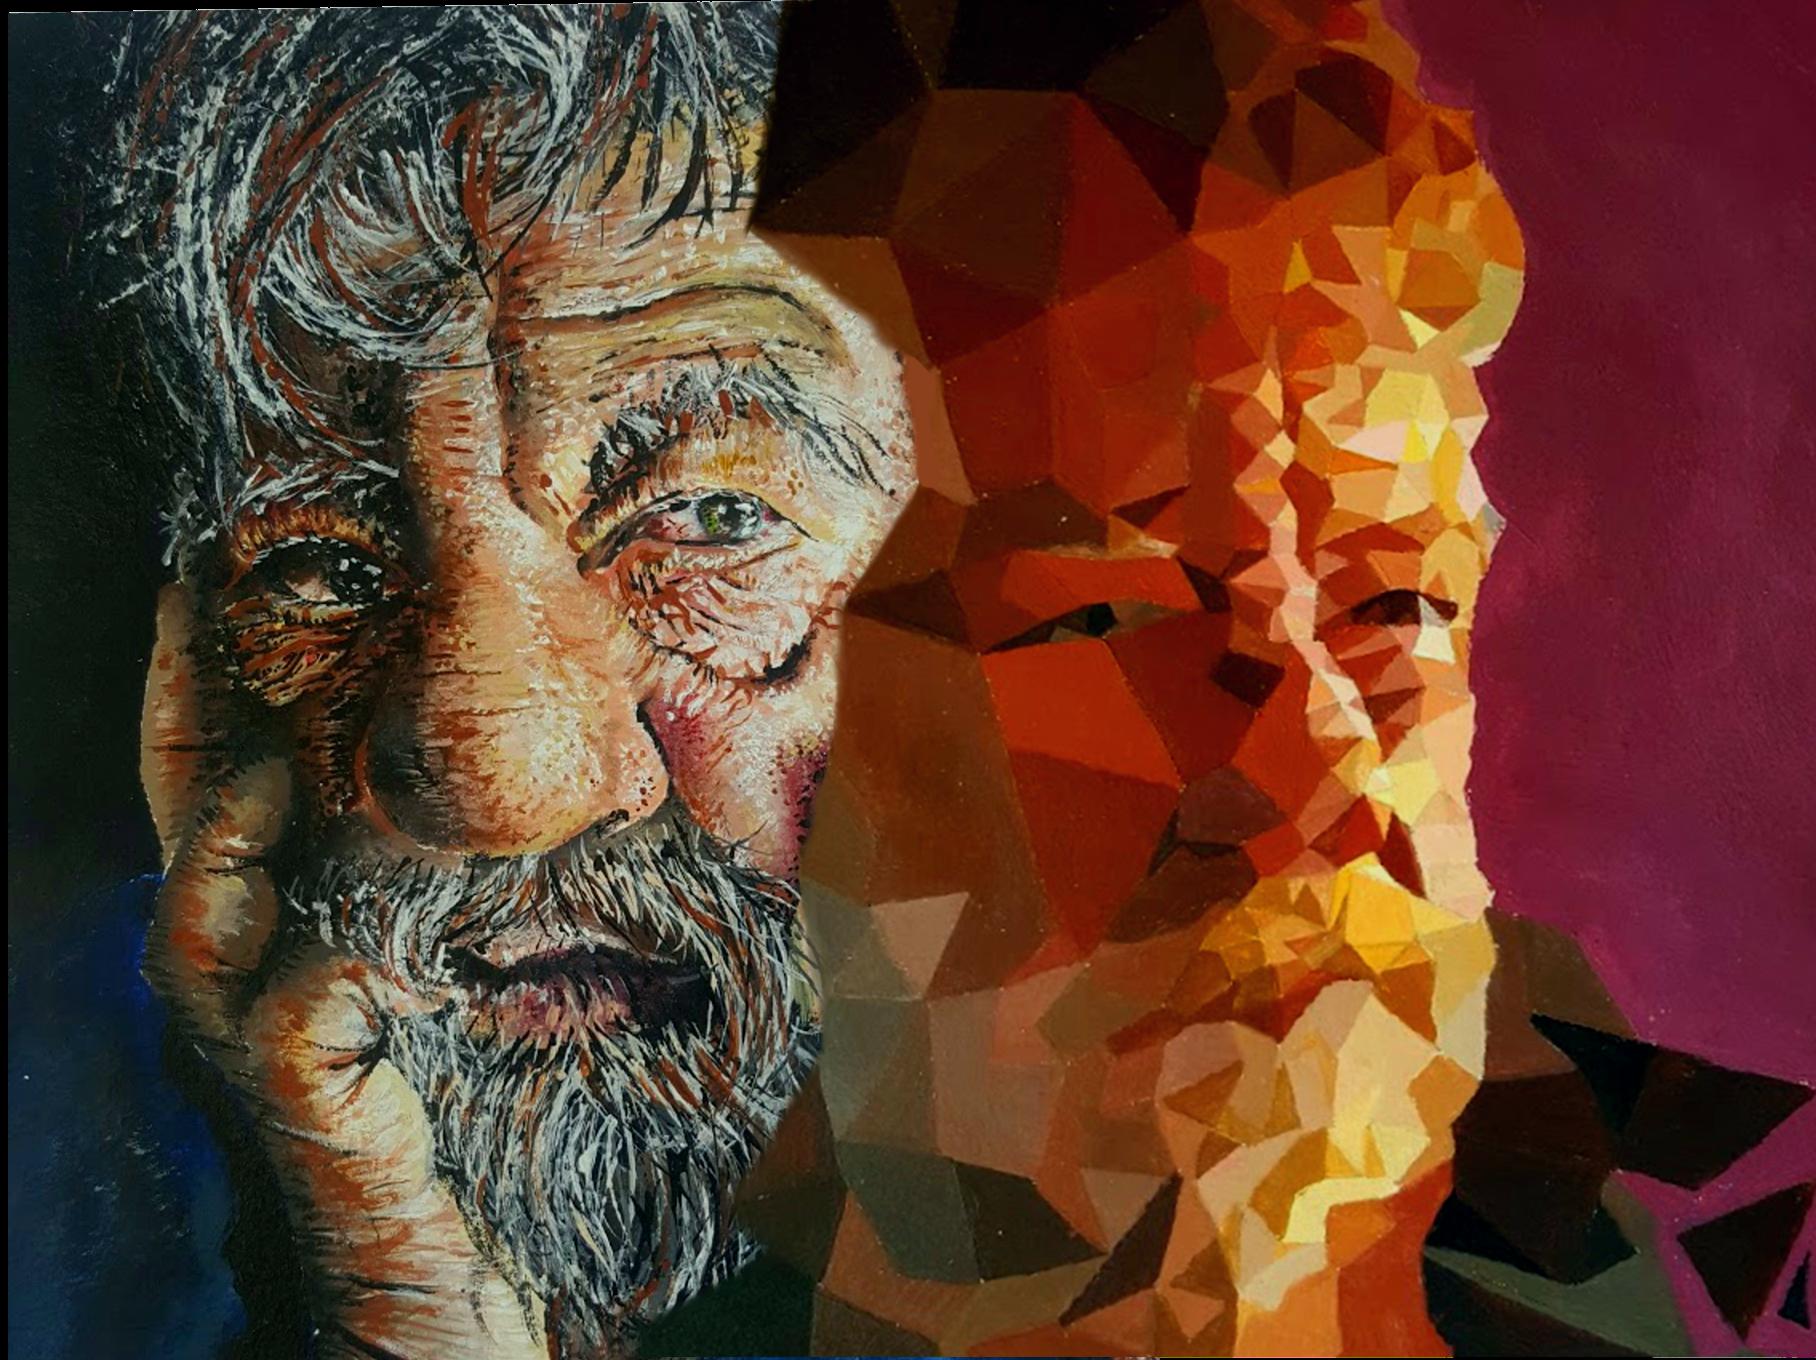 TRADIGITAL SUBMISSION - my grandfather, acrylic